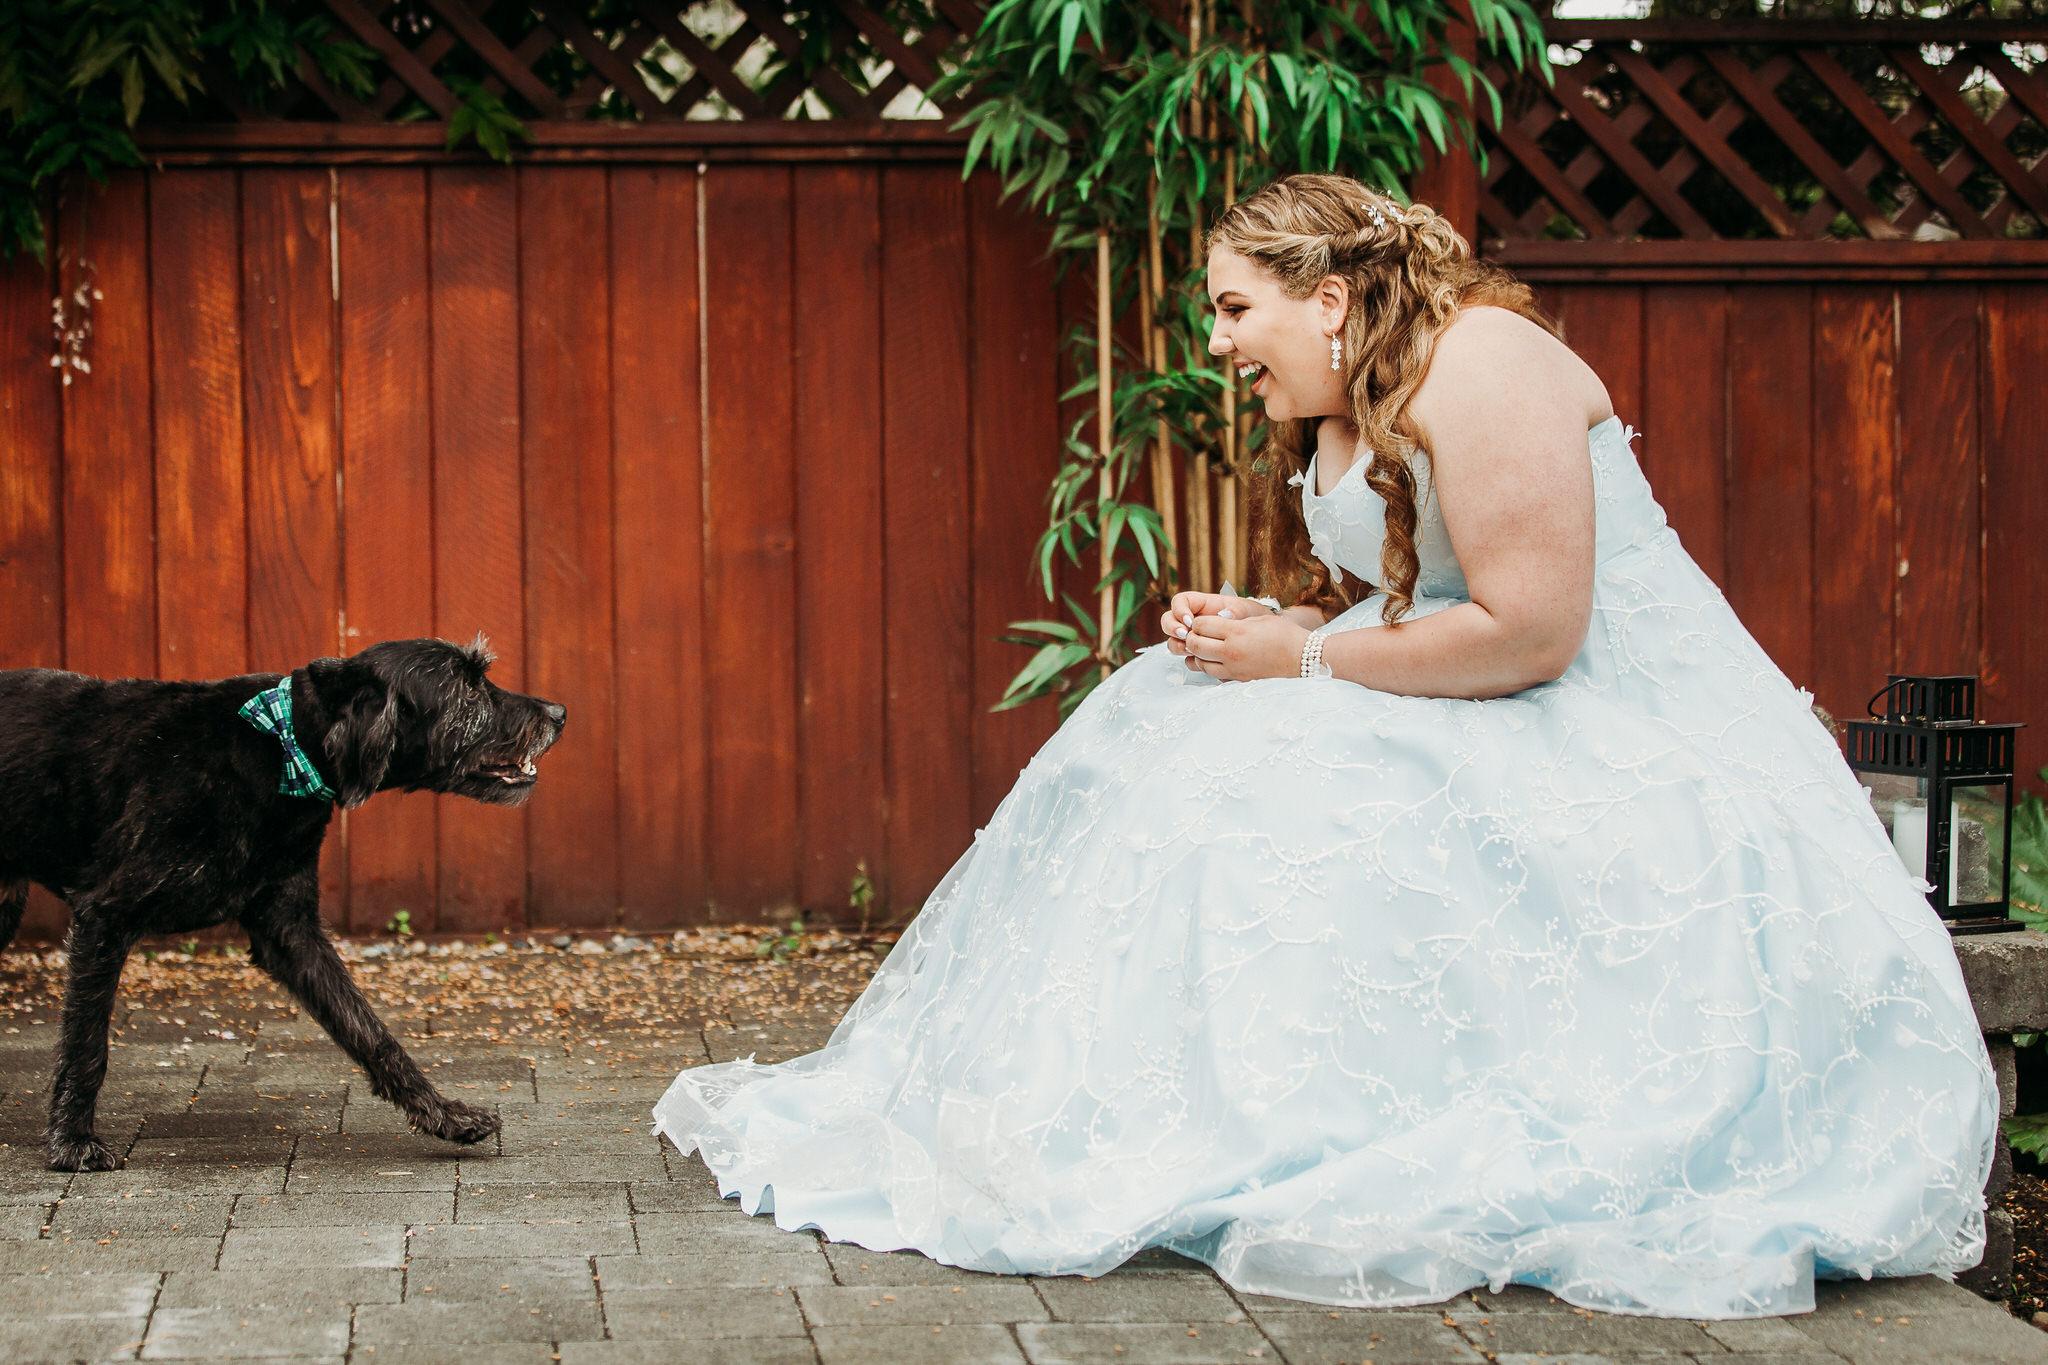 Chilliwack-Abbotsford-Prom-Graduation-Photographer- 1.jpg